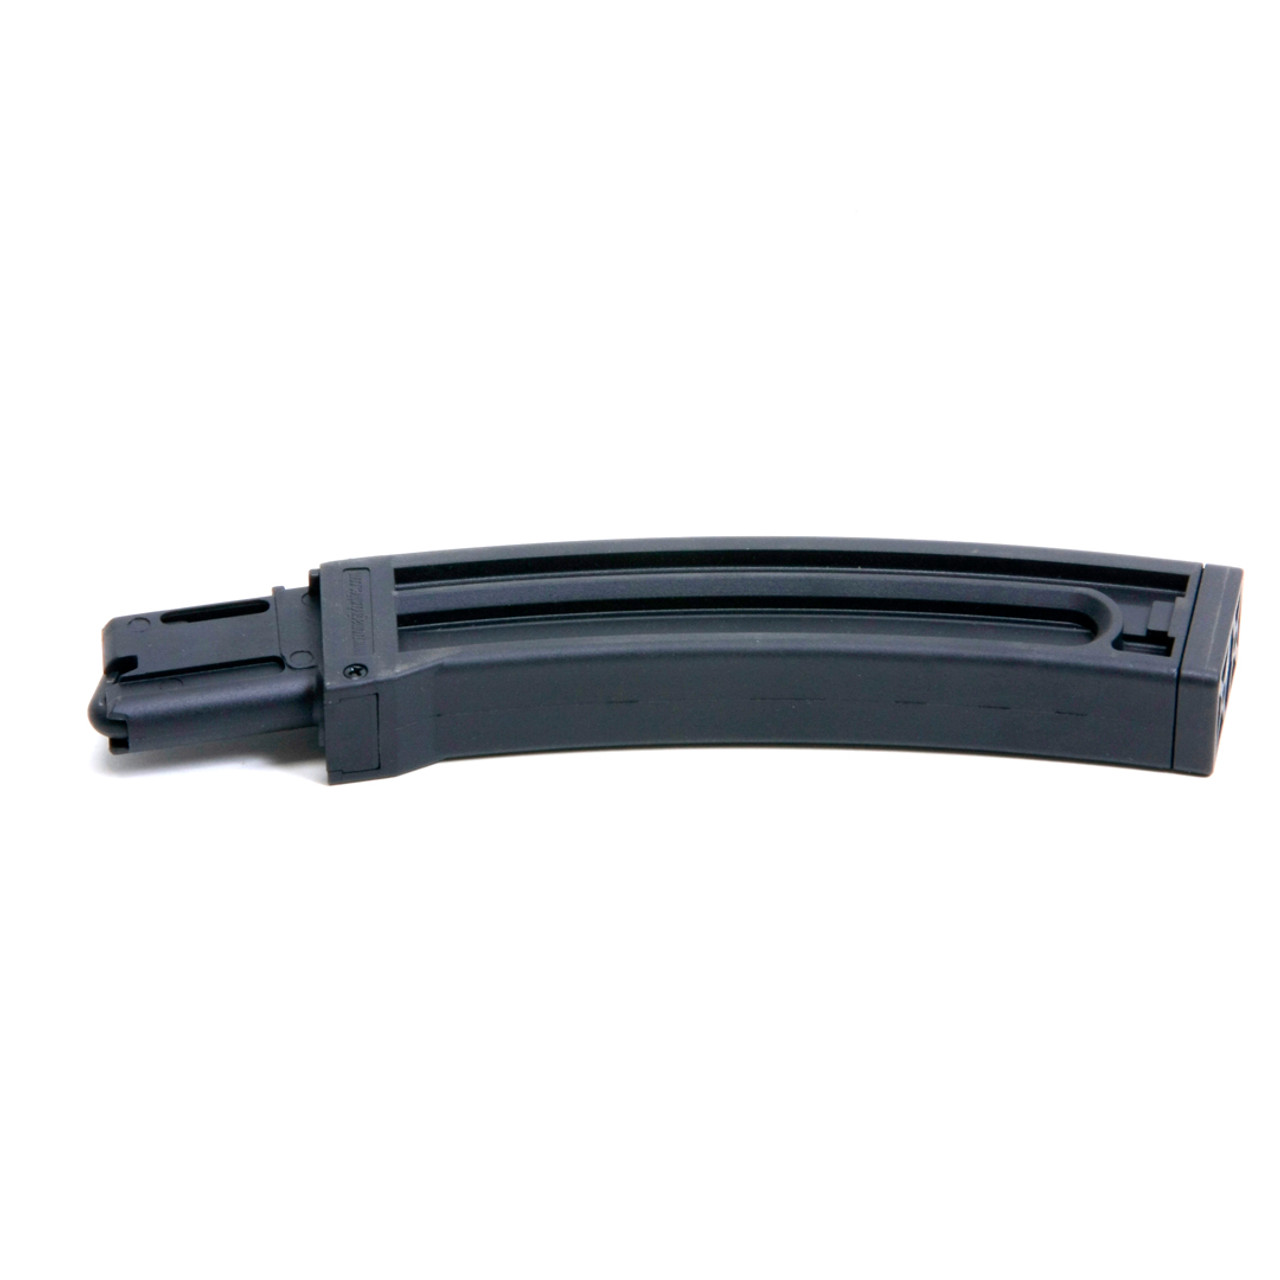 Marlin® 795 .22 LR (25) Rd - Black Polymer